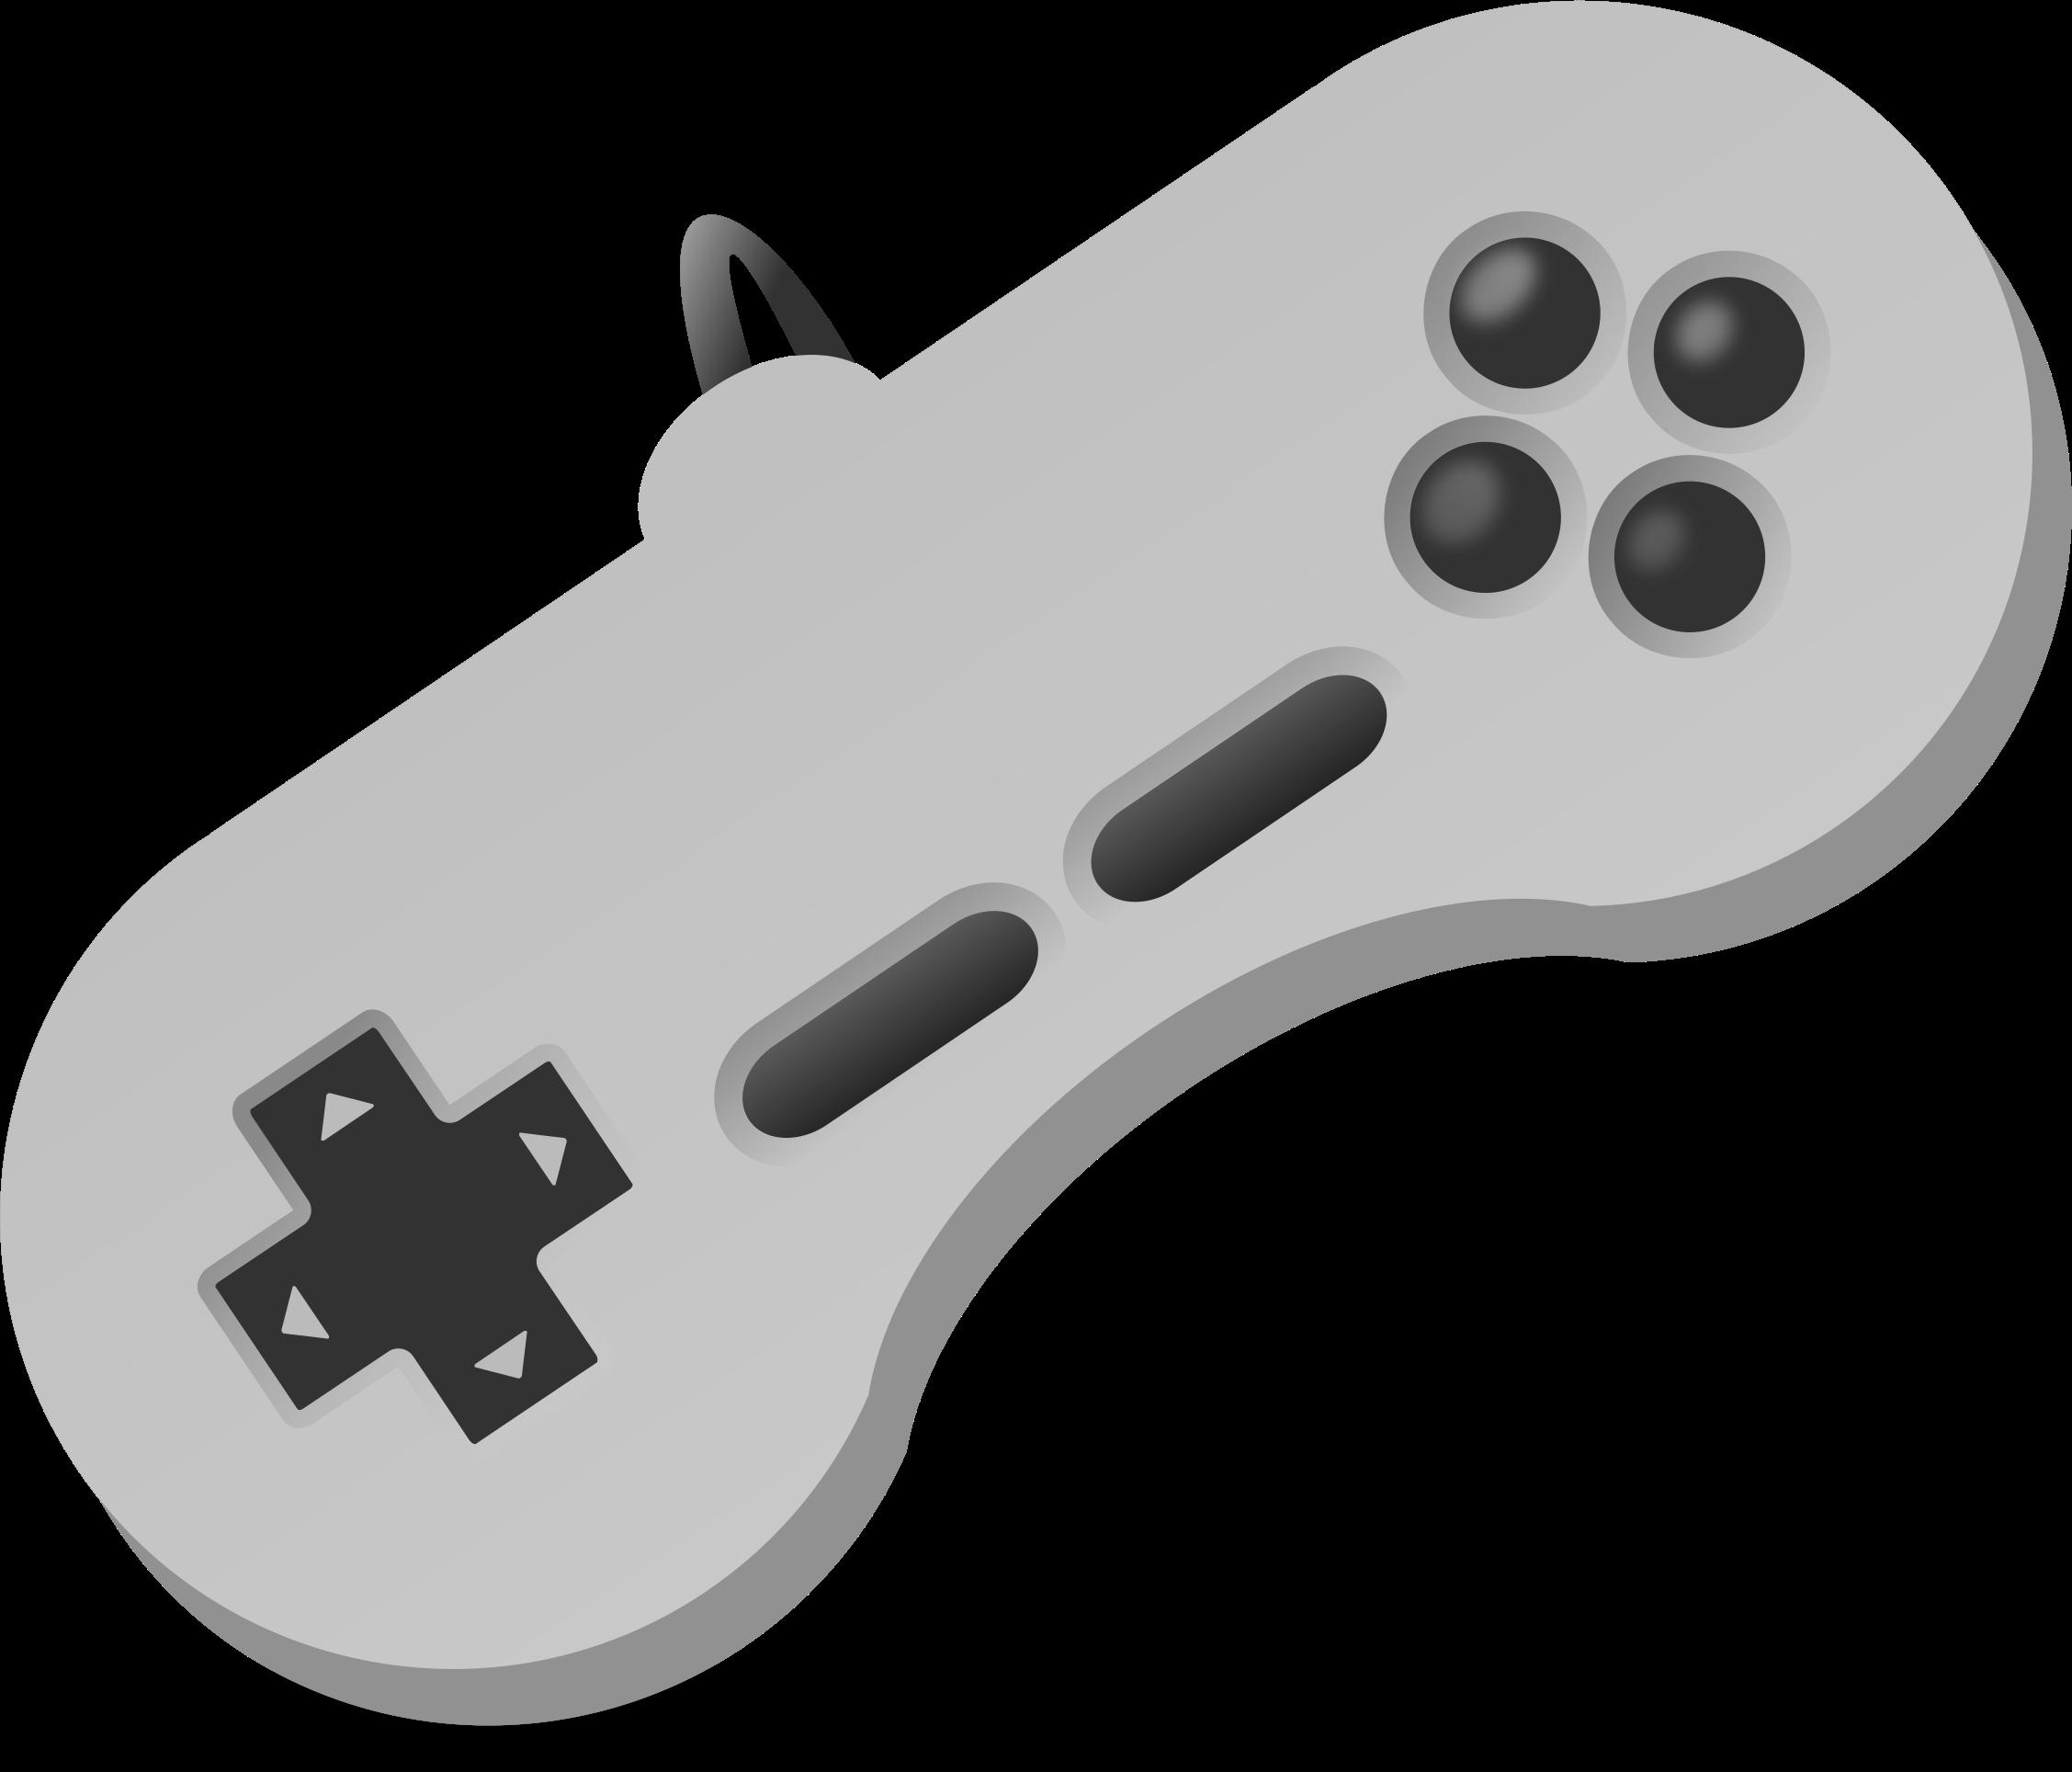 Game clipart 8 bit. Desktop joystick preferences icon